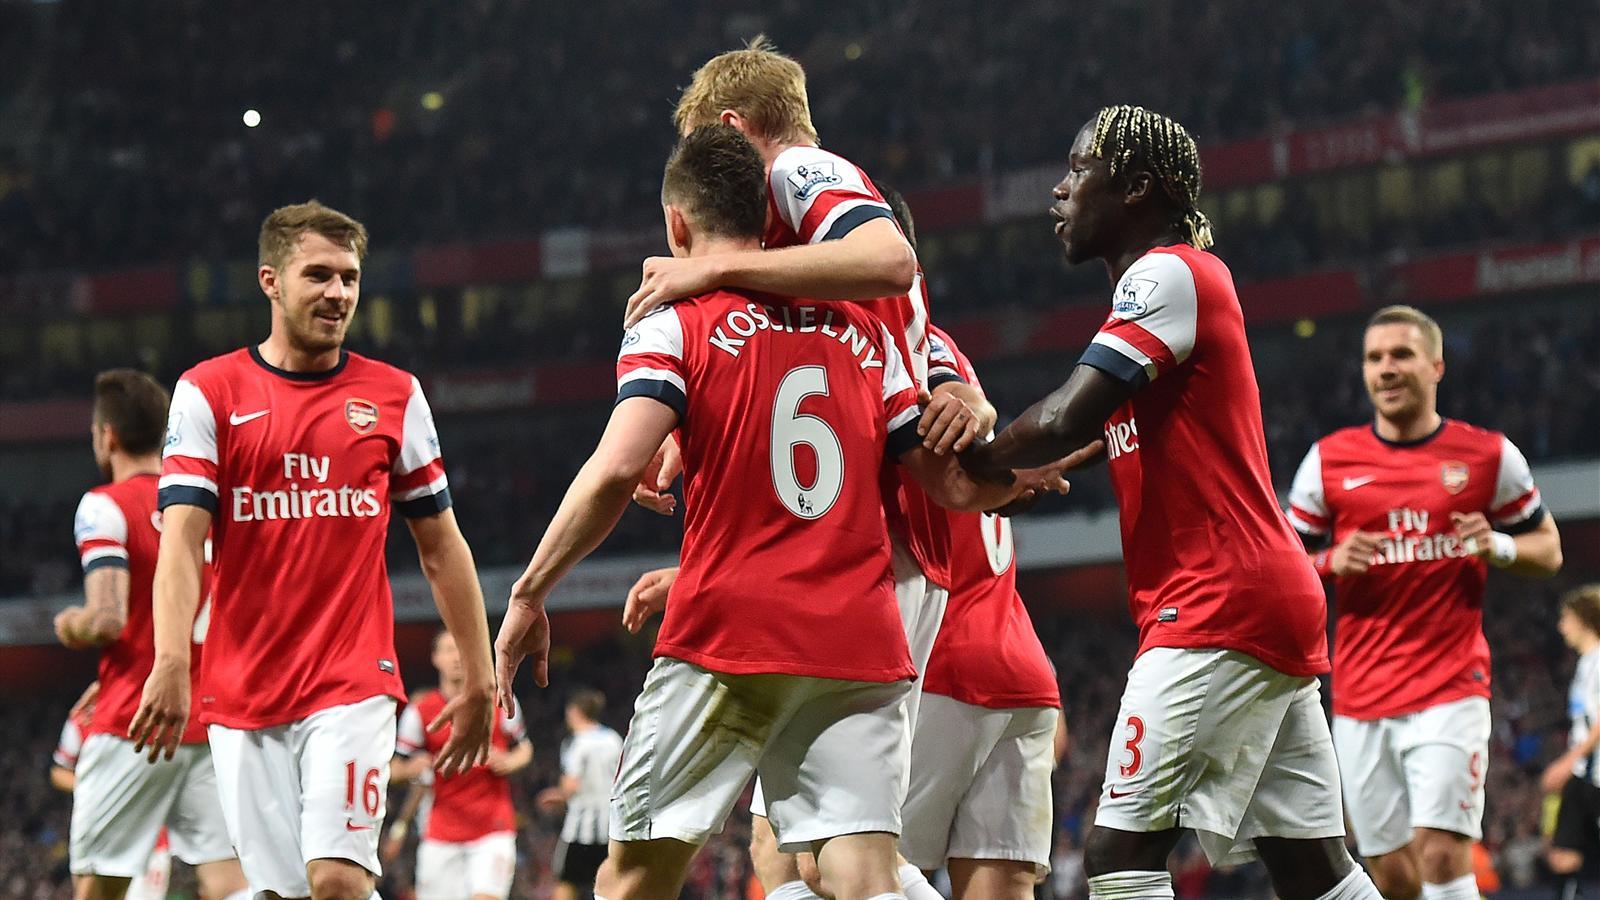 Goal by Laurent Koscielny, Arsenal - Newcastle, 2014